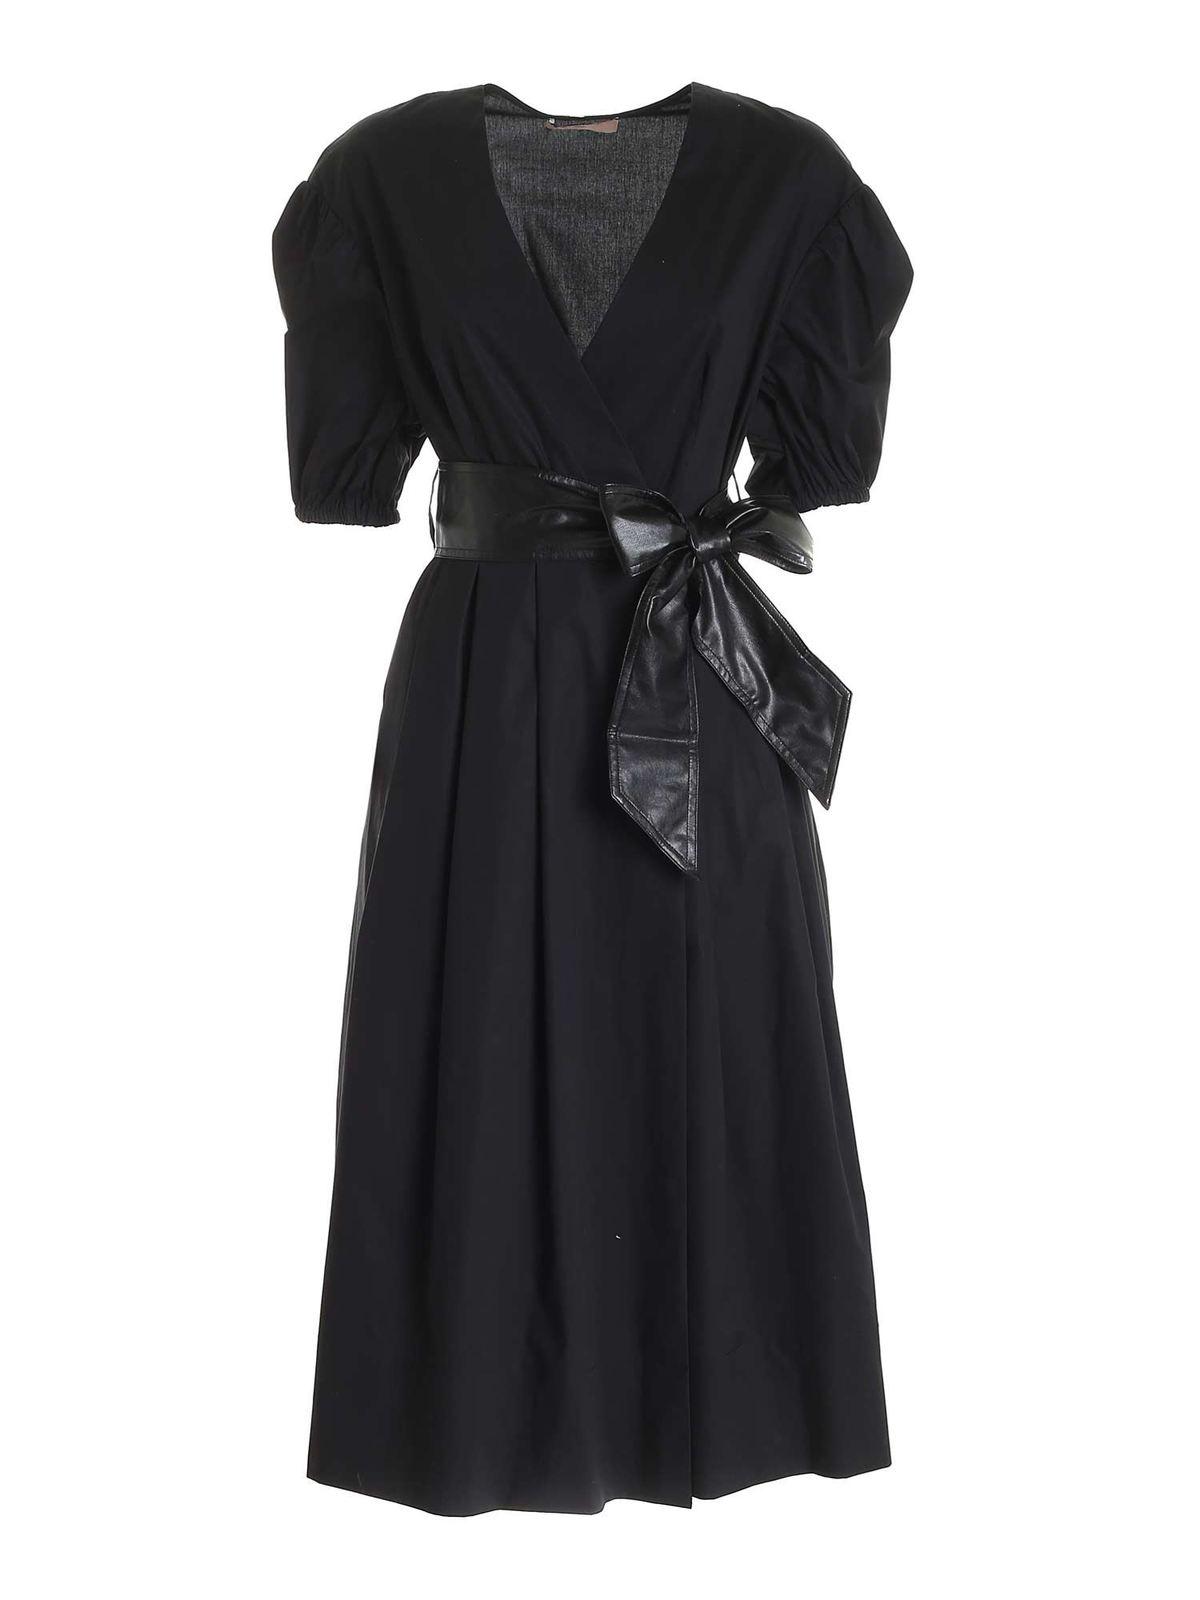 Twinset SASH WRAP DRESS IN BLACK